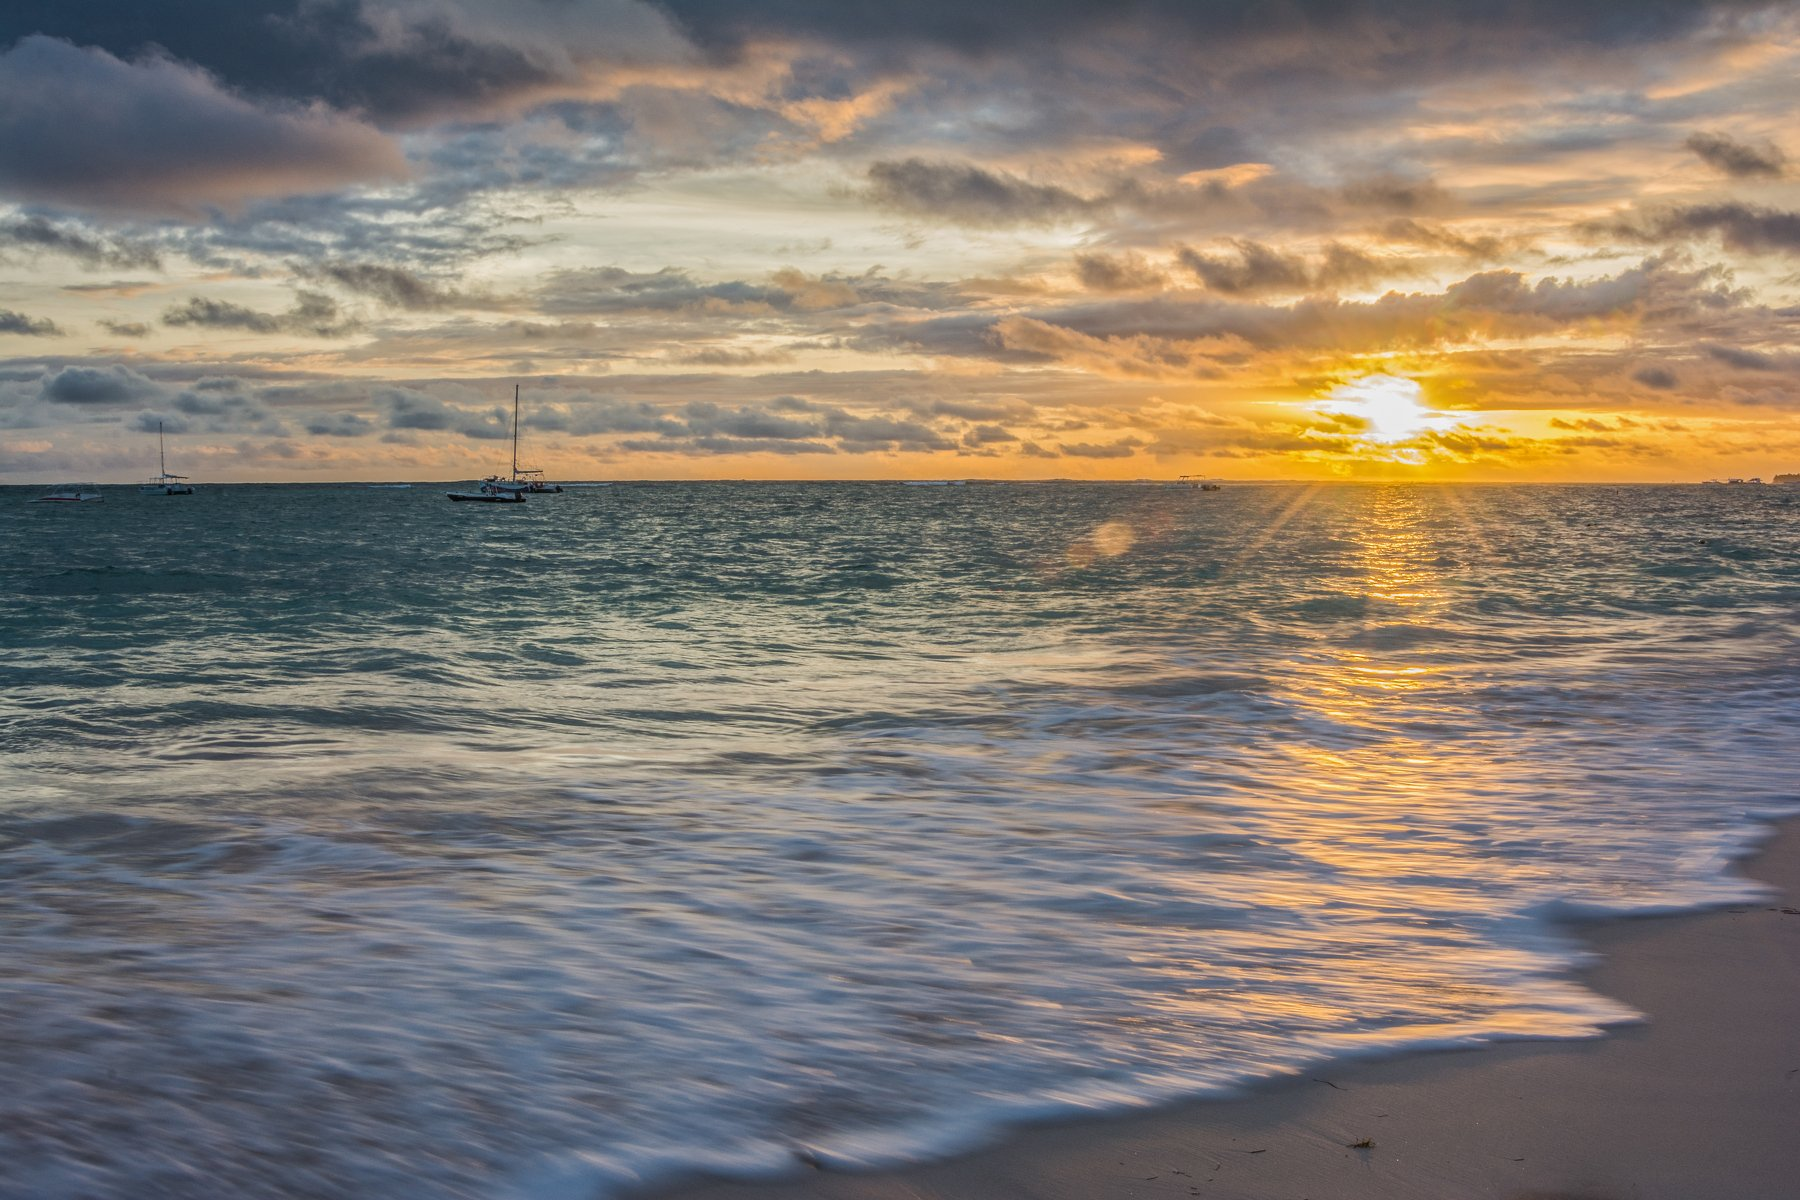 восход, солнце, небо, облака, яхта, океан, море, луч, Атлантика, пляж, Sergey Oslopov